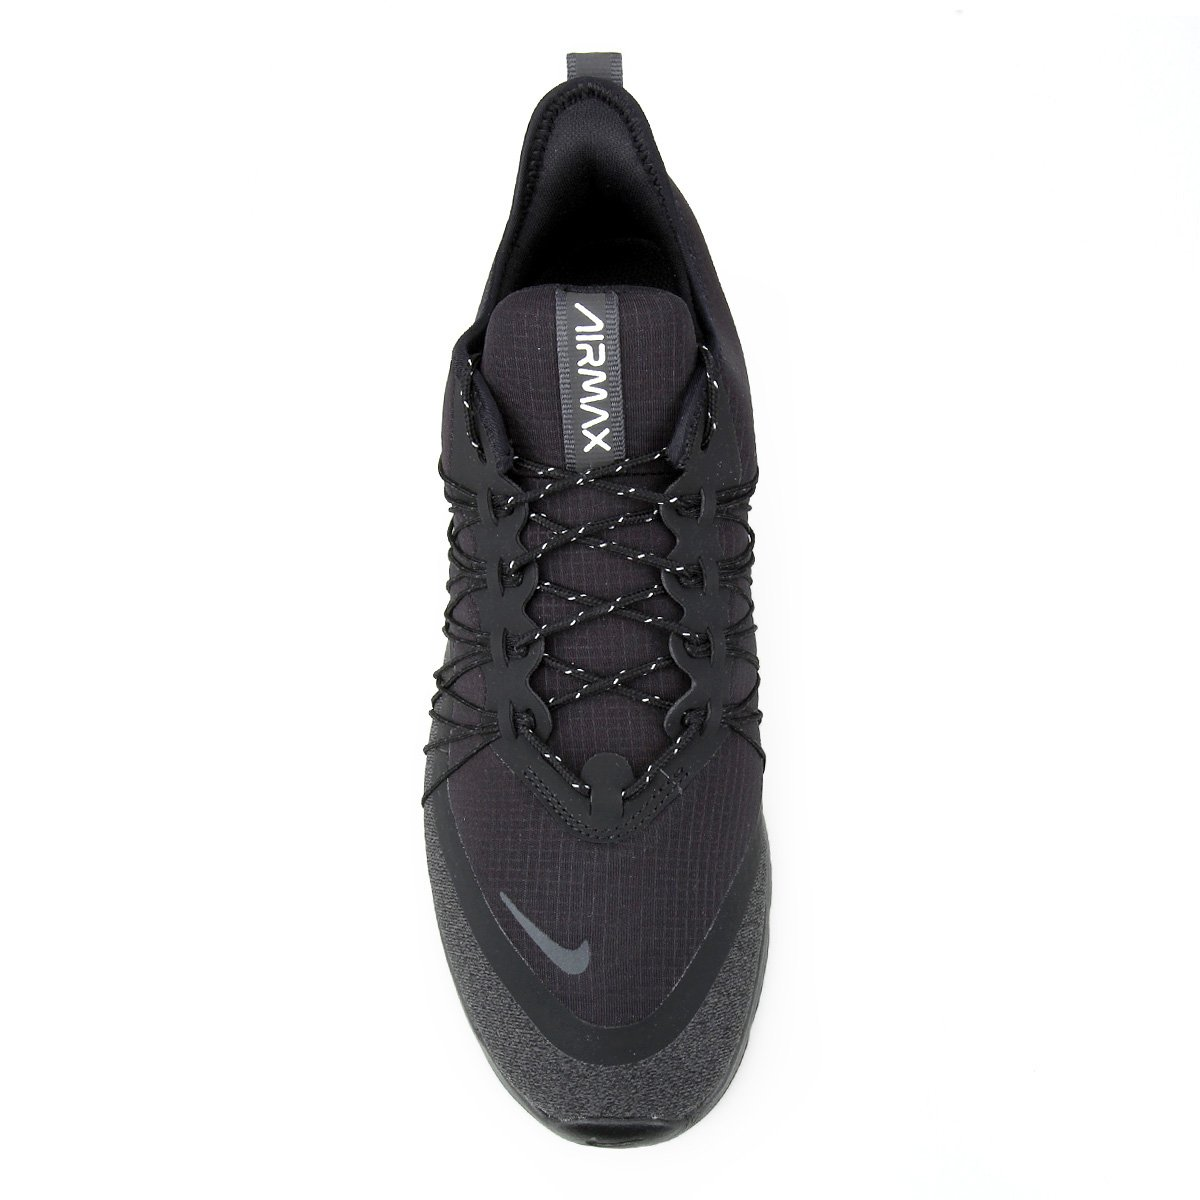 Tênis Nike Air Max Sequent 4 Utility Masculino - 2